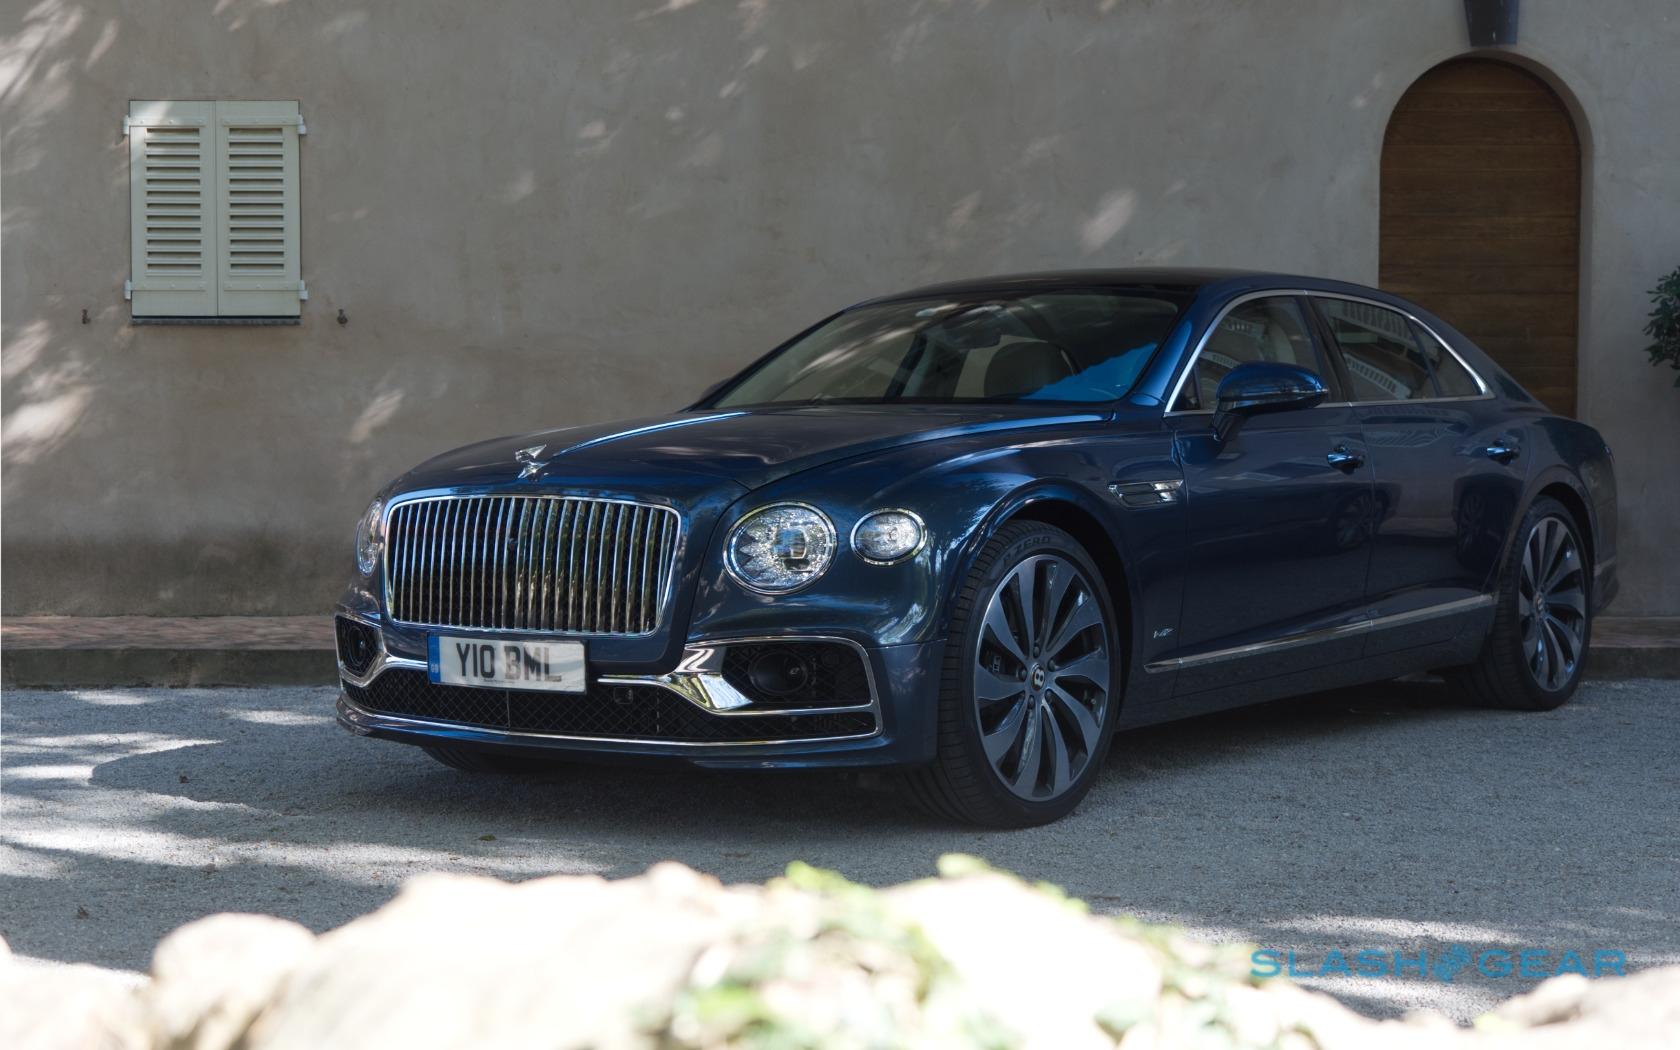 2020 Bentley Flying Spur Gallery Slashgear